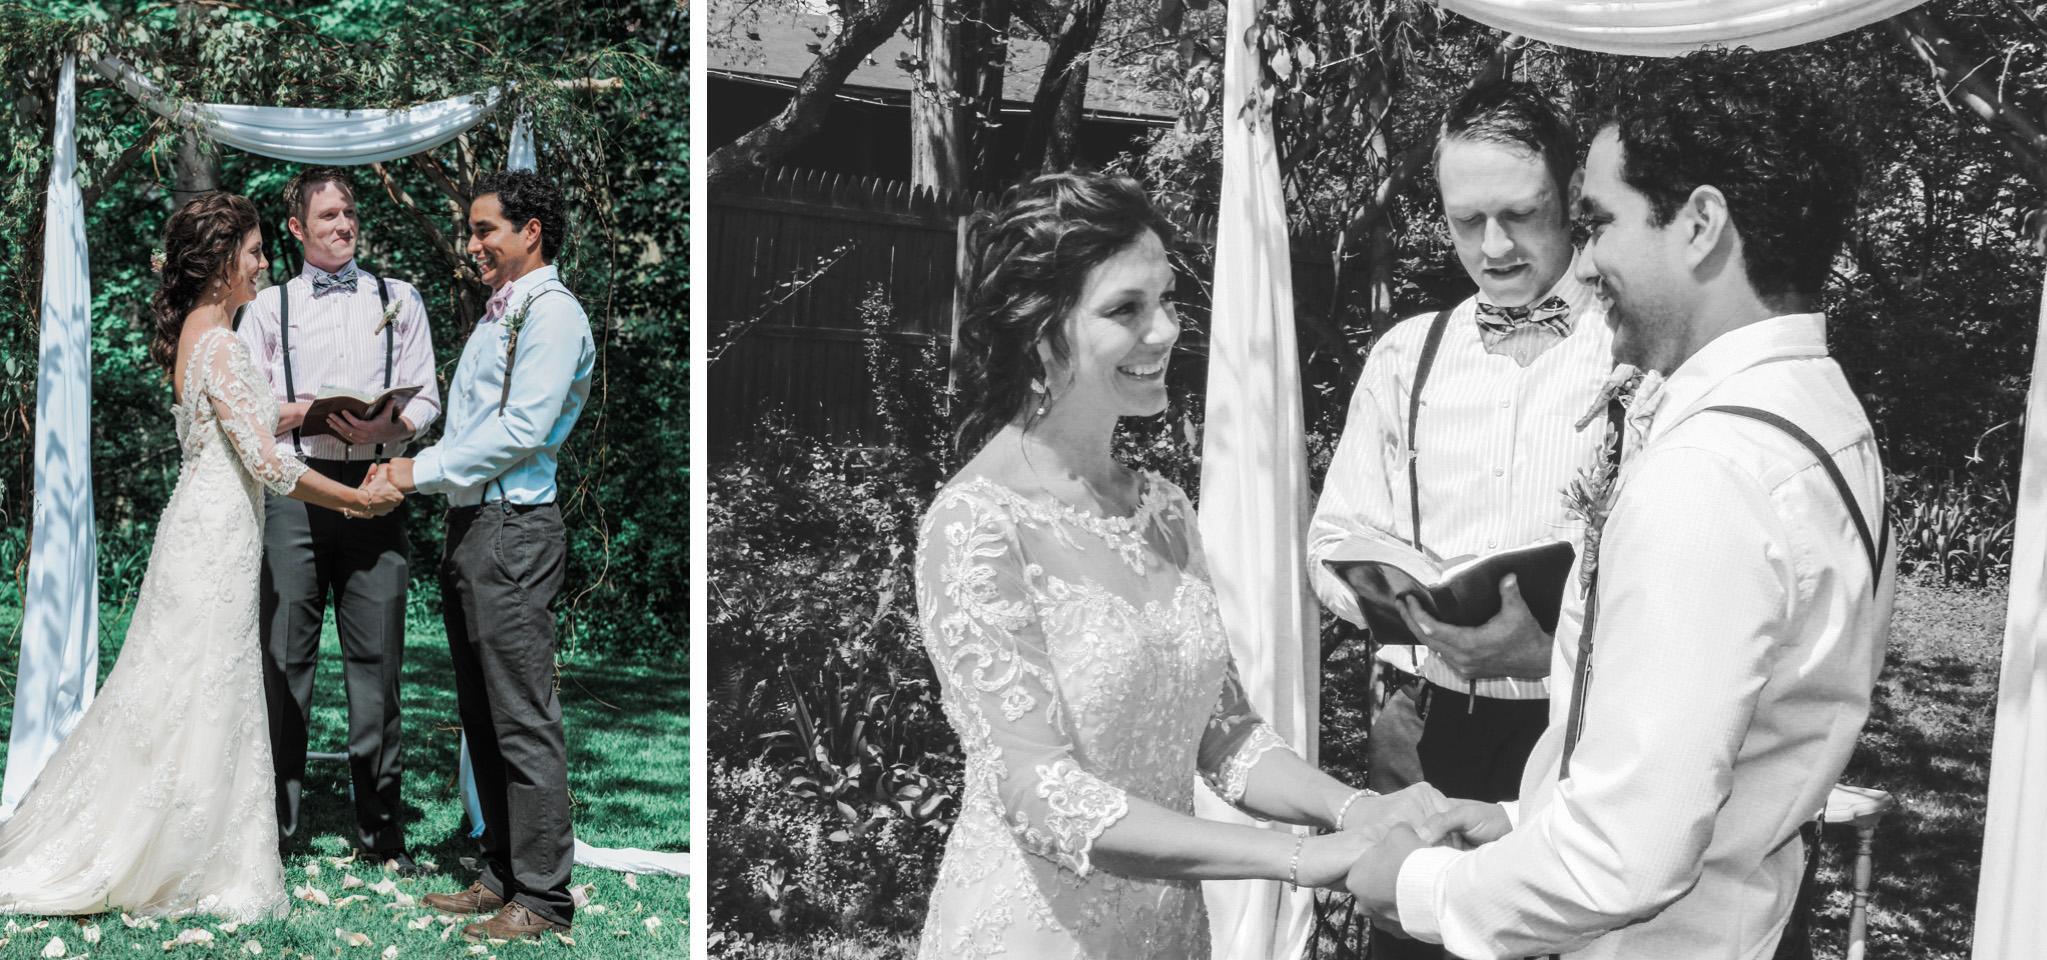 Altoona wedding photographer_Julie Israel (31).jpg